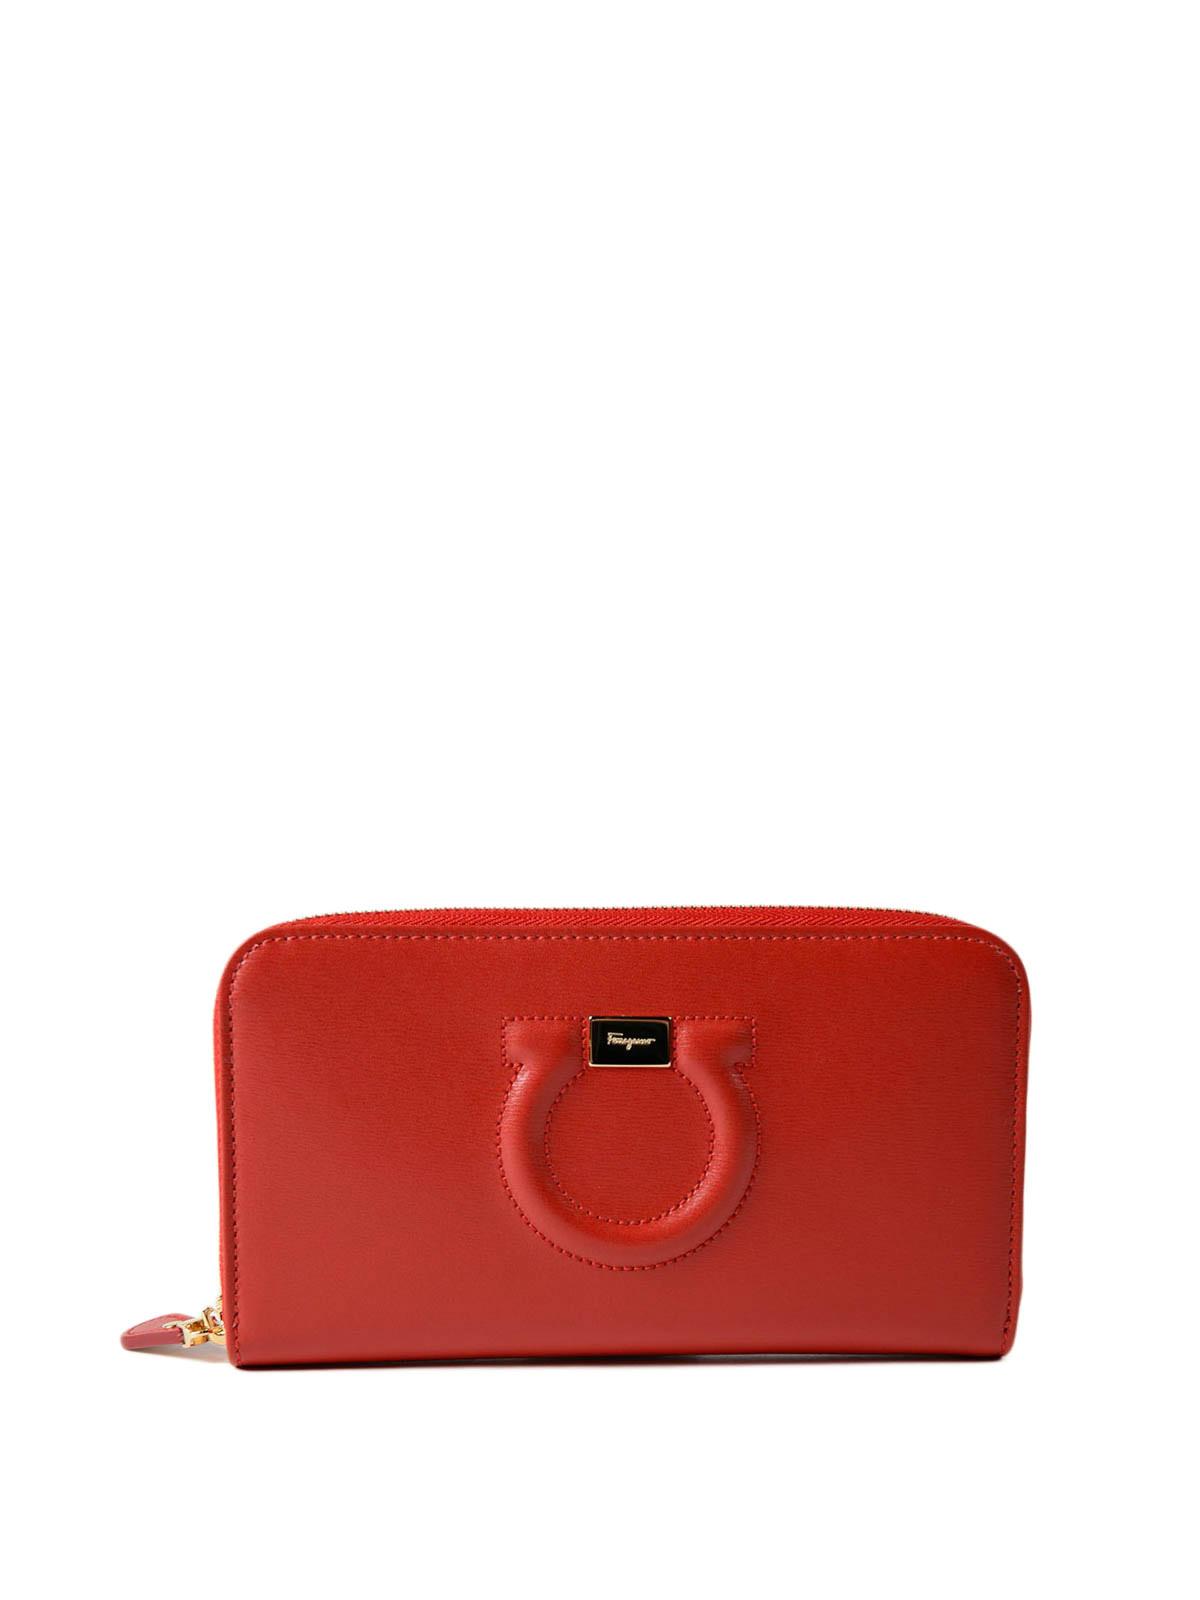 4ef3b7b76e7fe SALVATORE FERRAGAMO  wallets   purses - Gancini leather continental wallet